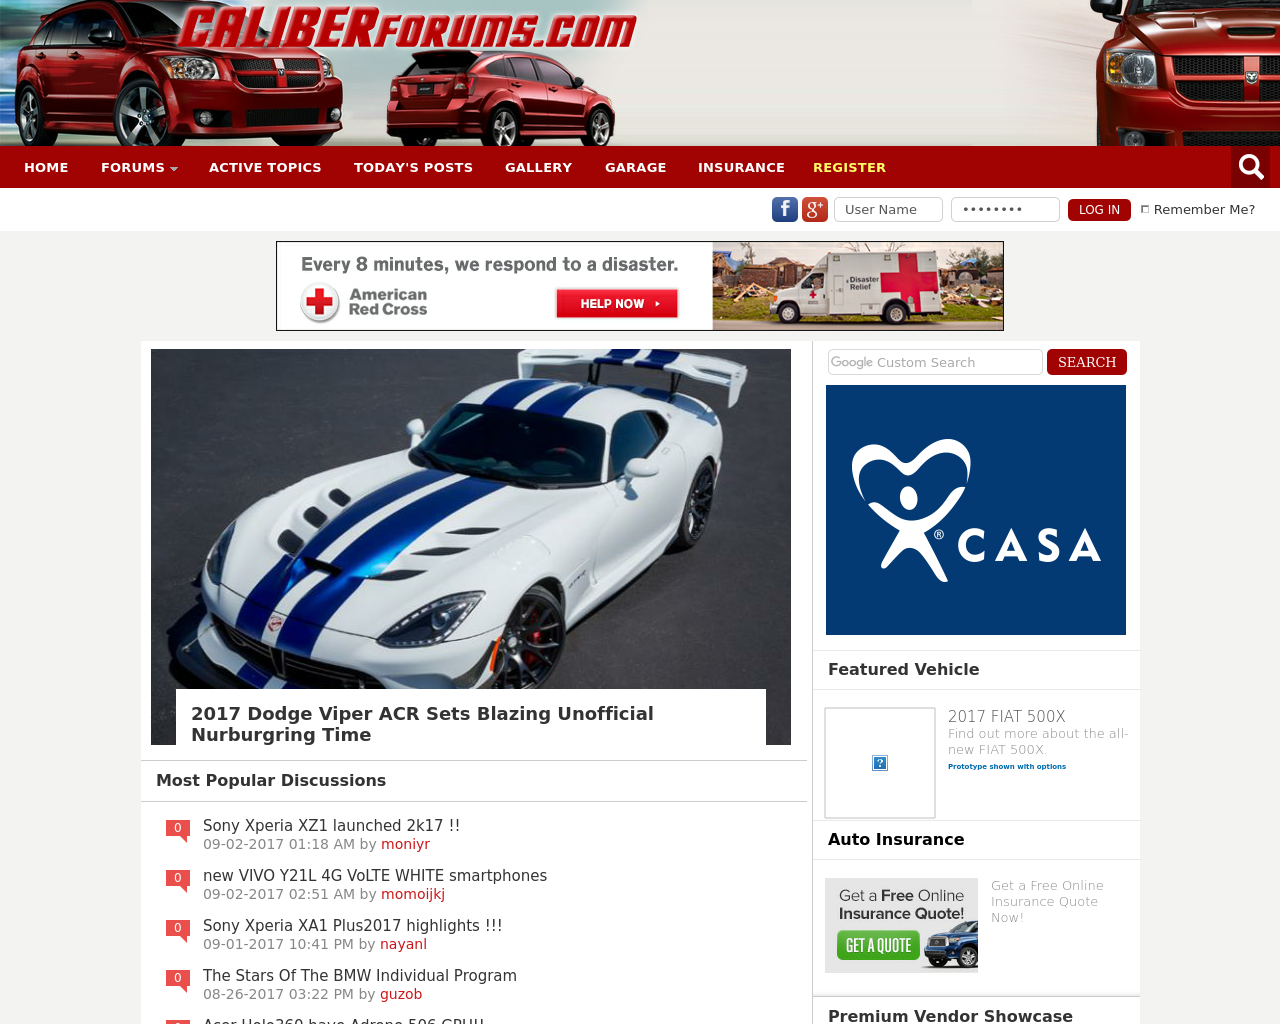 Caliber-Forums-Advertising-Reviews-Pricing